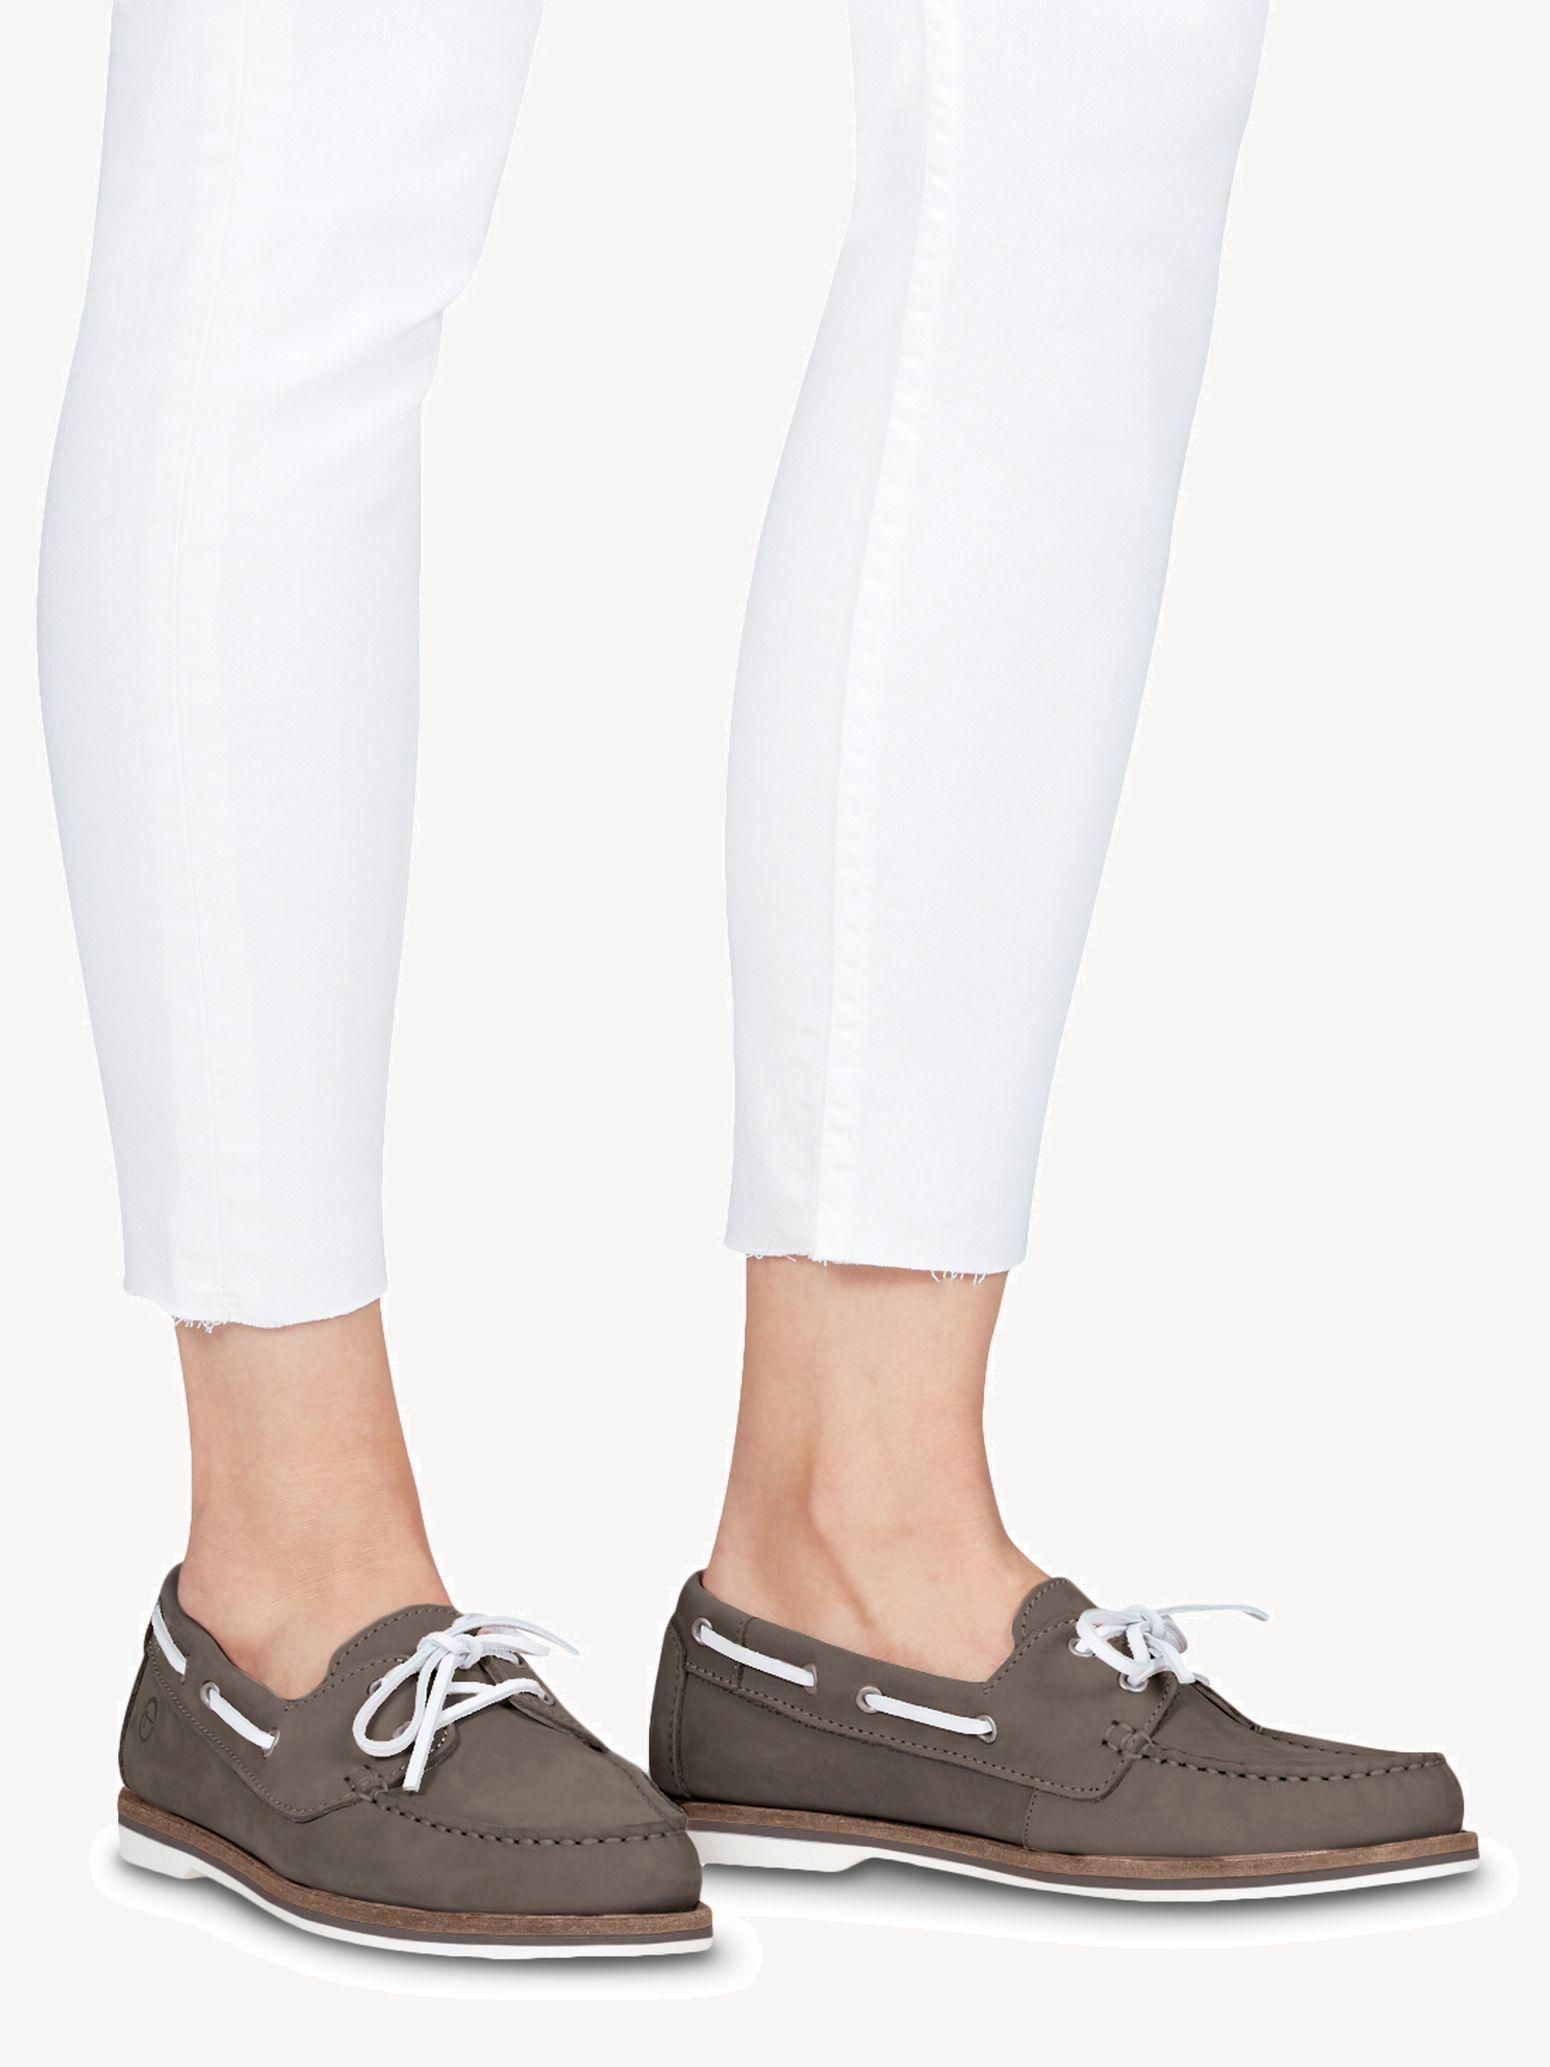 online store a56a3 e7e1f Schuhe Tamaris Schuhe Nubuk Tamaris Senfgelb Schuhe Tamaris ...